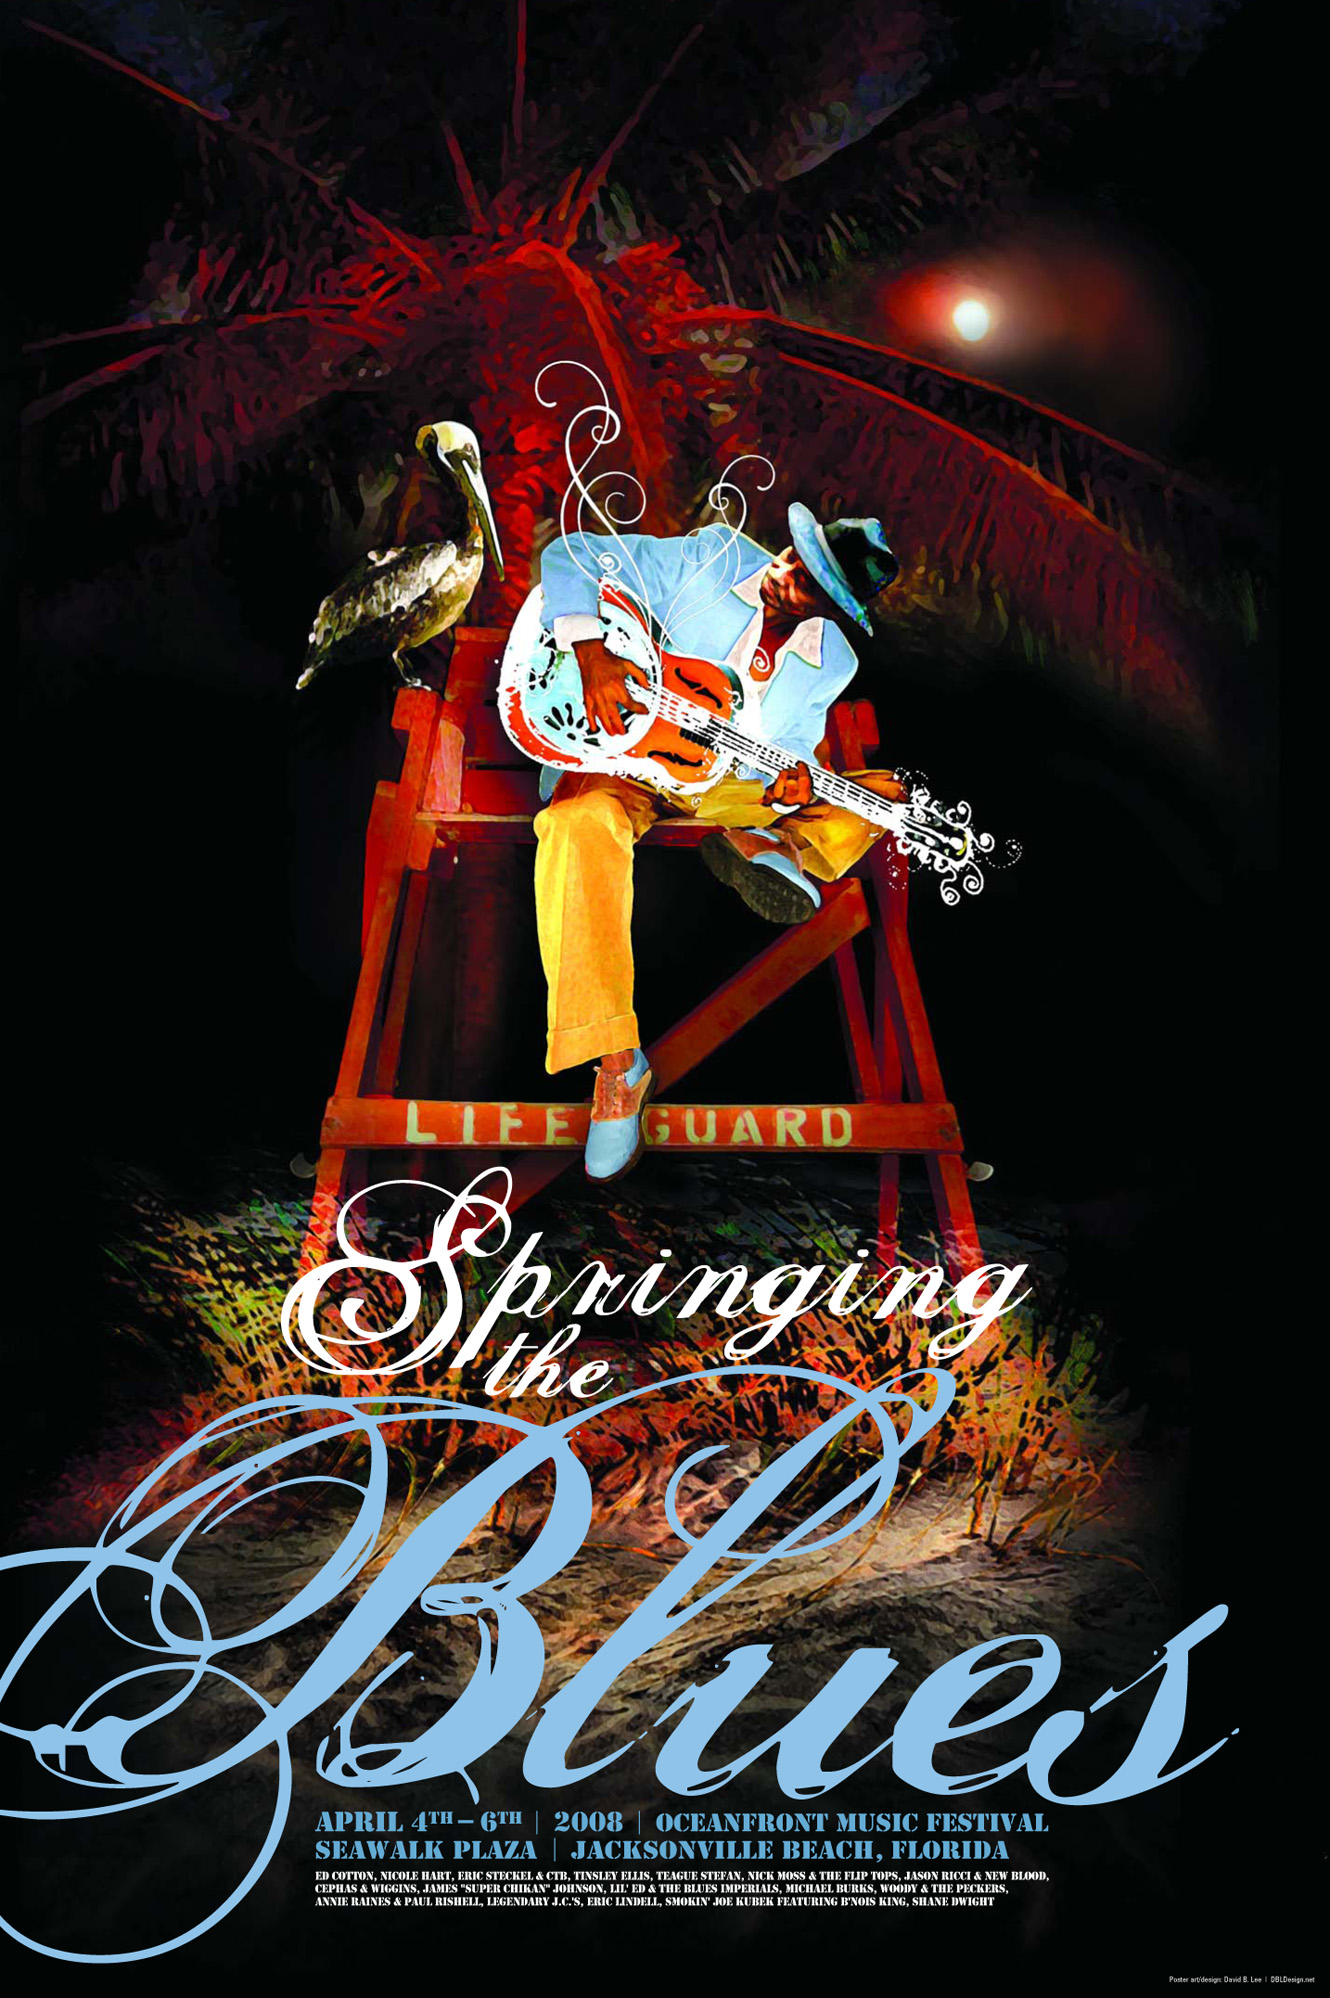 Print Design Portfolio | Springing The Blues Poster 2008 | David B. Lee